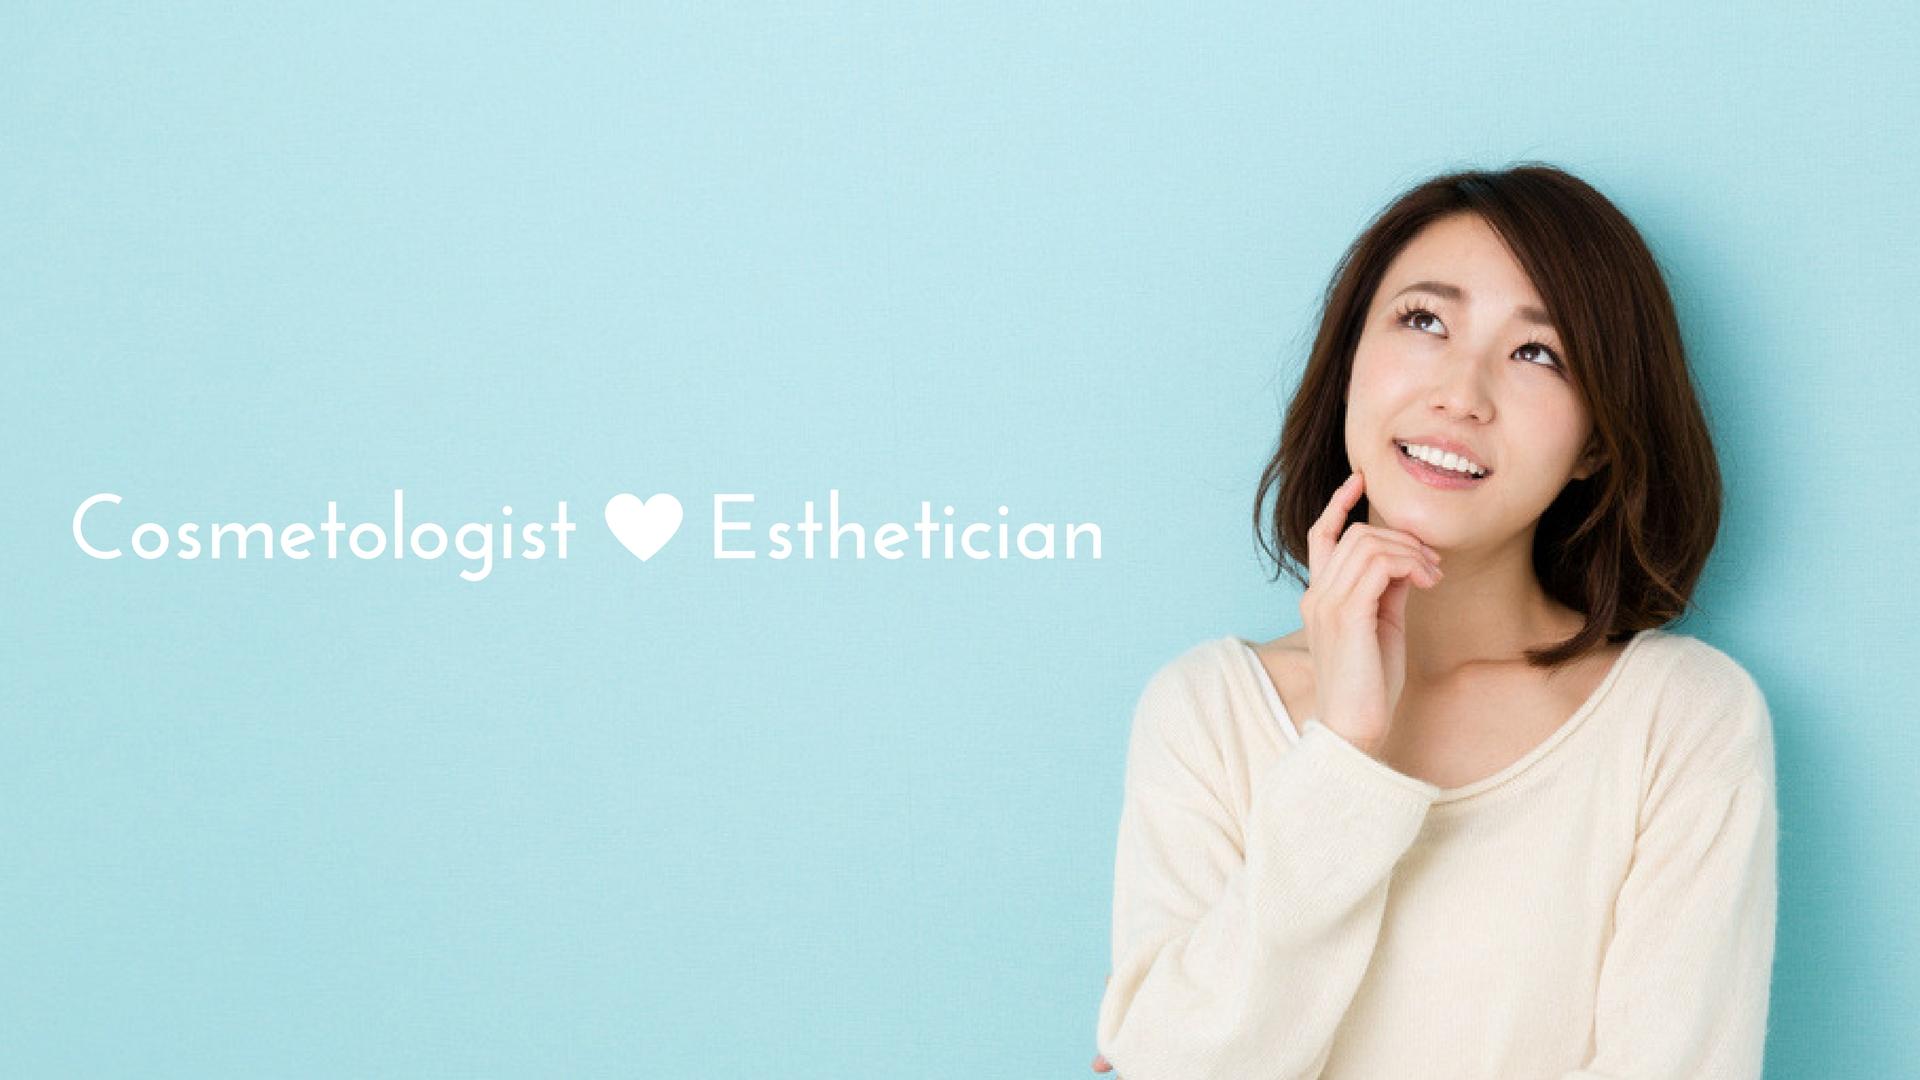 Cosmetologist vs Esthestician